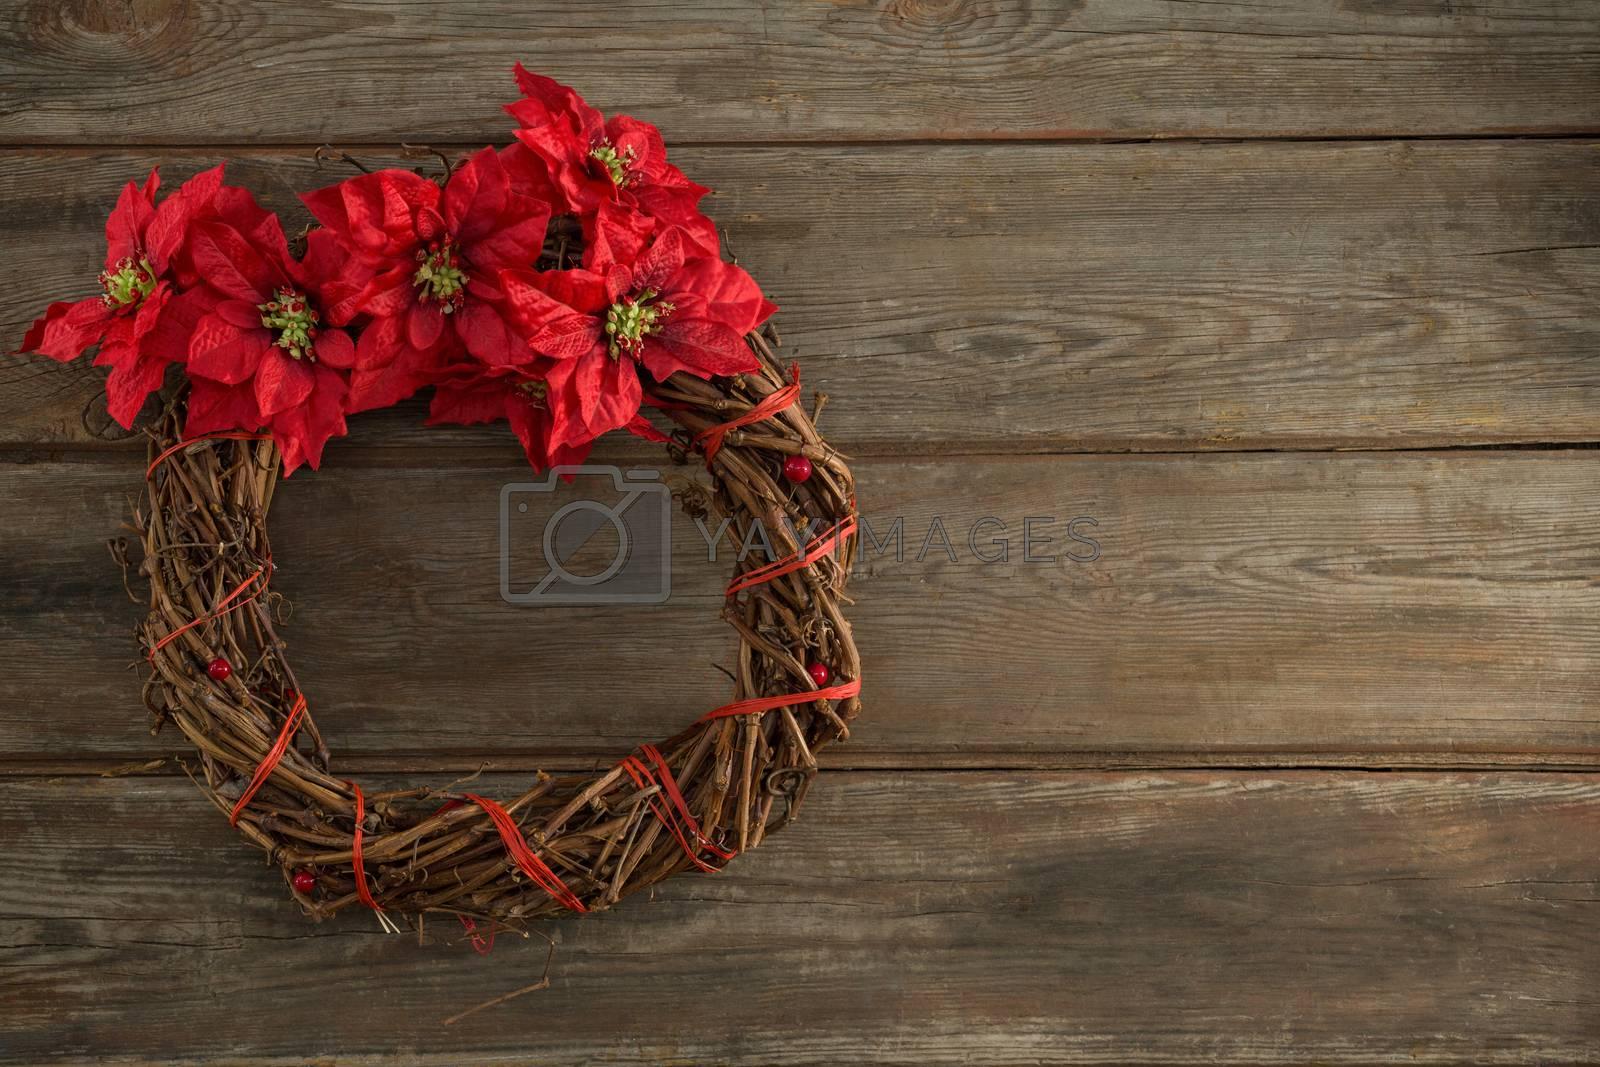 Christmas wreath on wooden plank by Wavebreakmedia